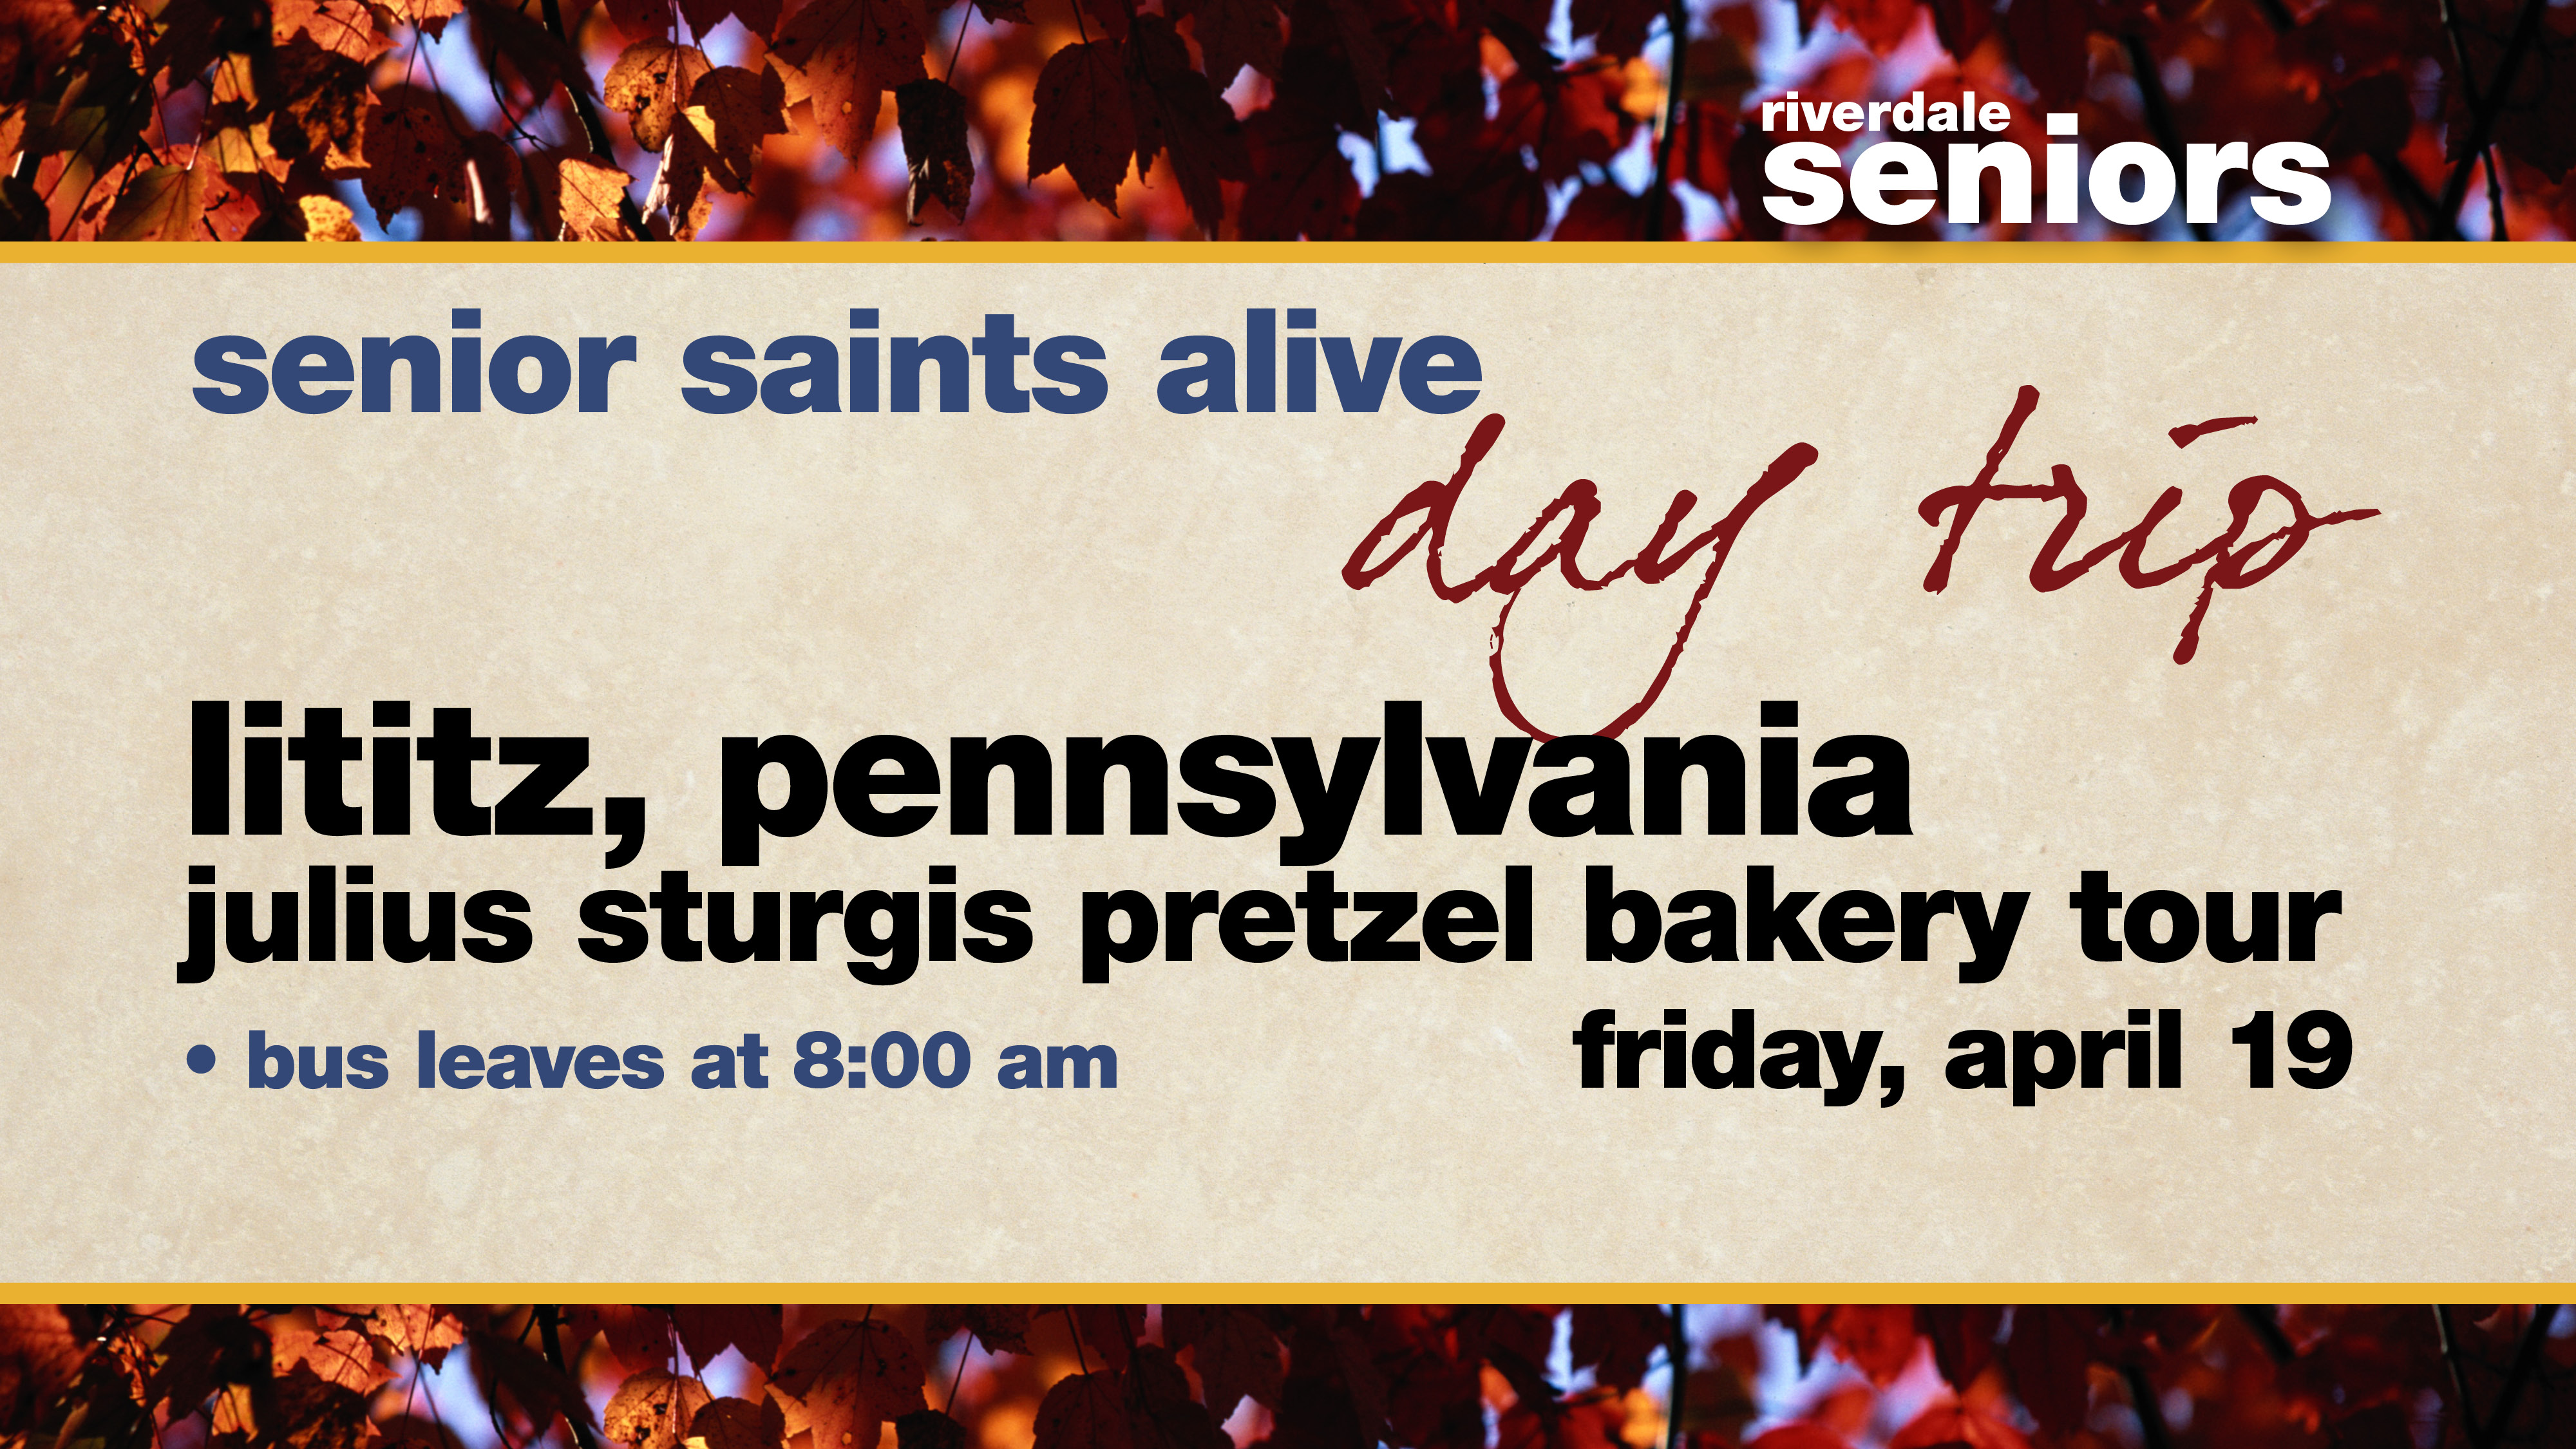 Senior_Saints_Day_Trip class=